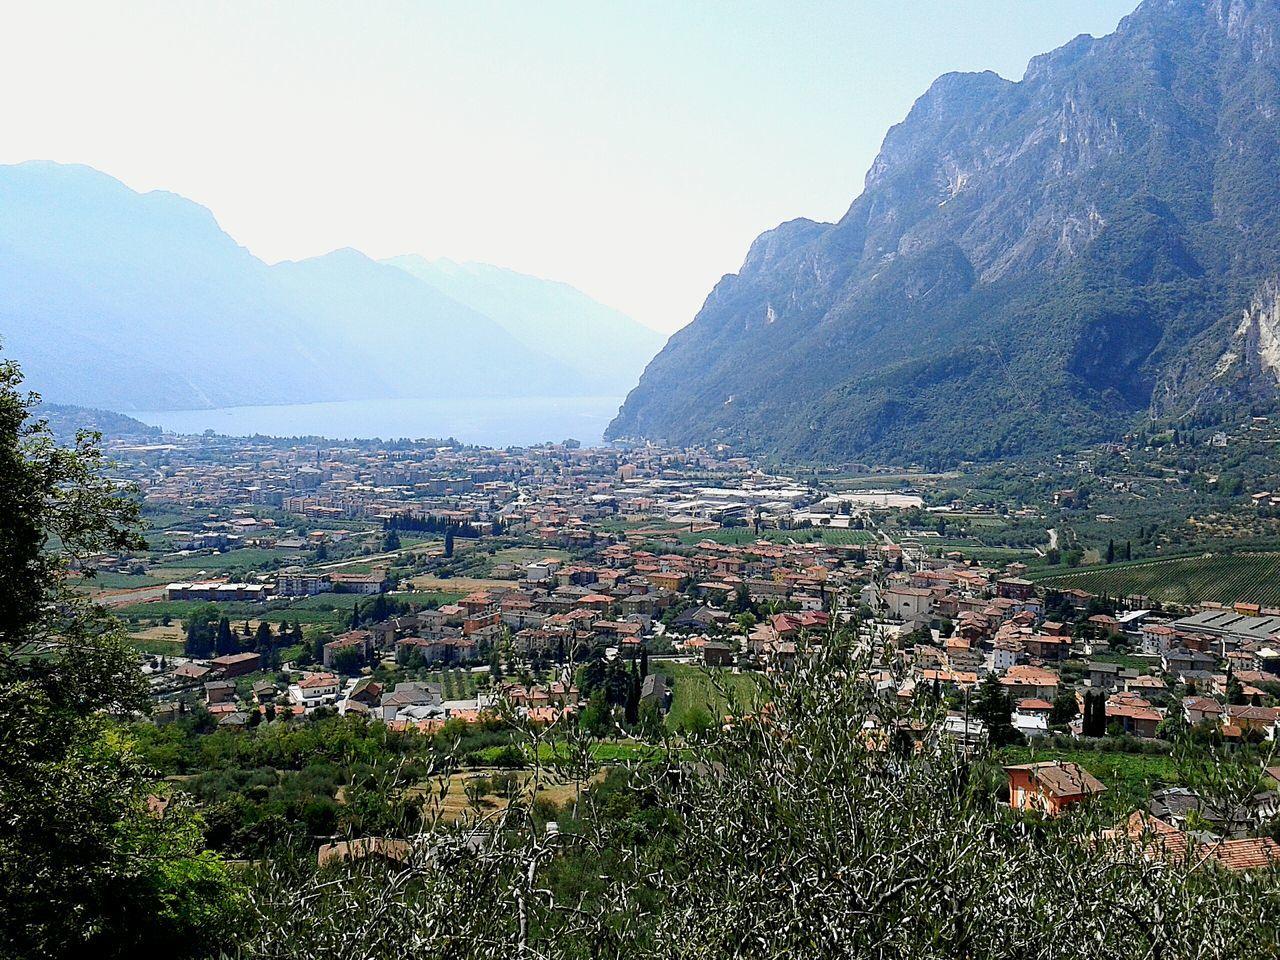 Lago di garda Mountain Sky Outdoors Mountain Range Cityscape Scenics Nature Summer ☀ Beauty In Nature Italy 🇮🇹 Lake